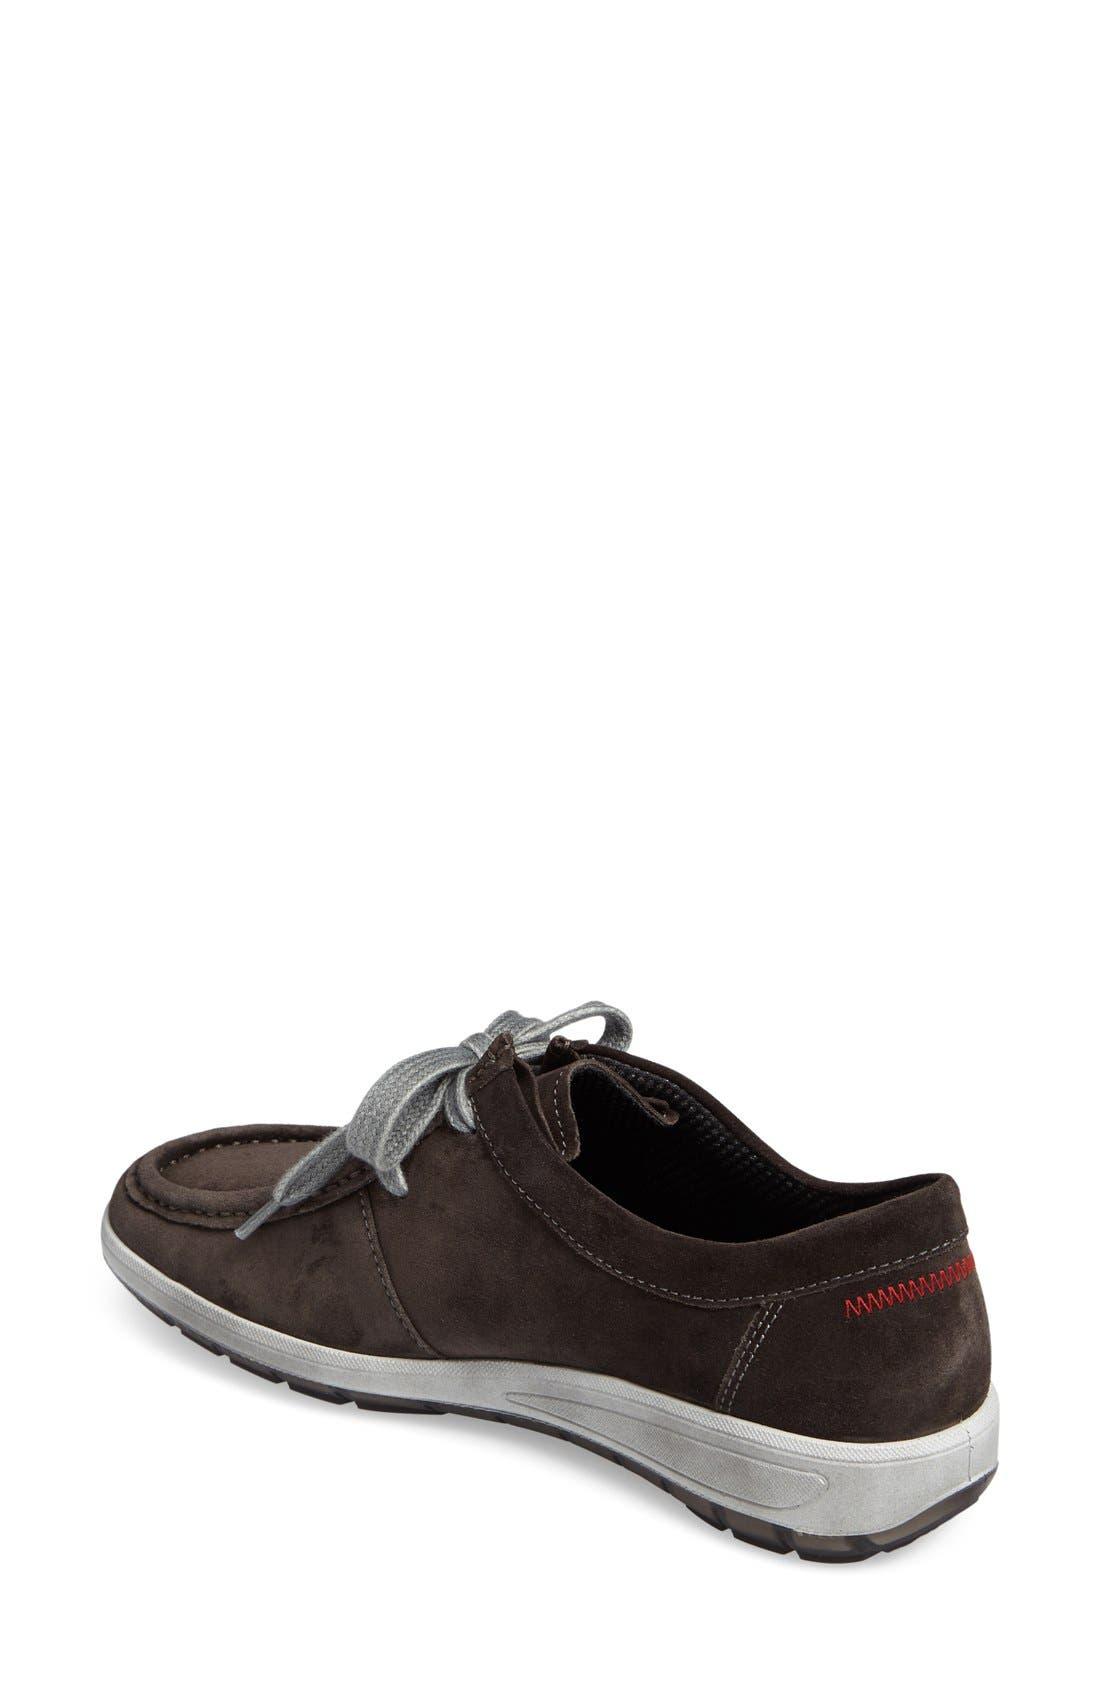 Trista Sneaker,                             Alternate thumbnail 5, color,                             LAVA SUEDE